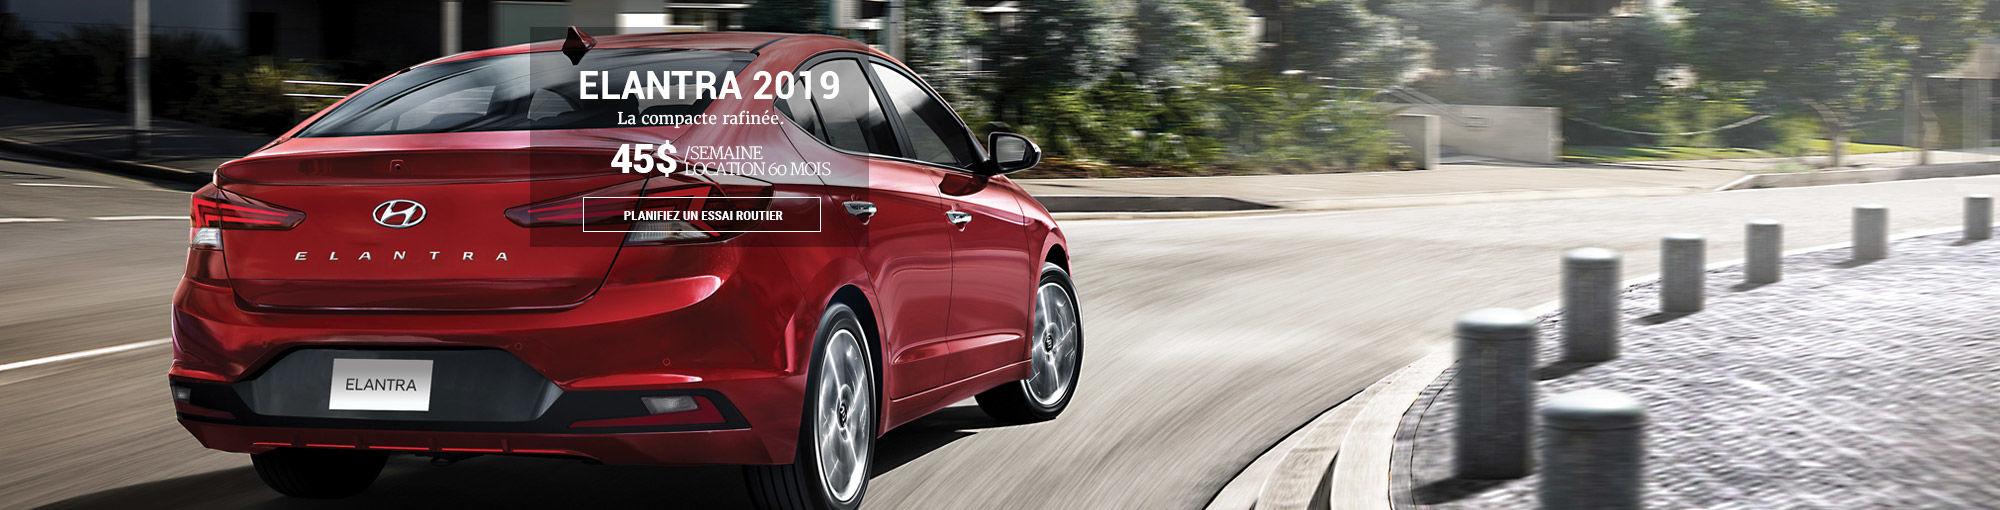 Hyundai elantra header 2019-  novembre